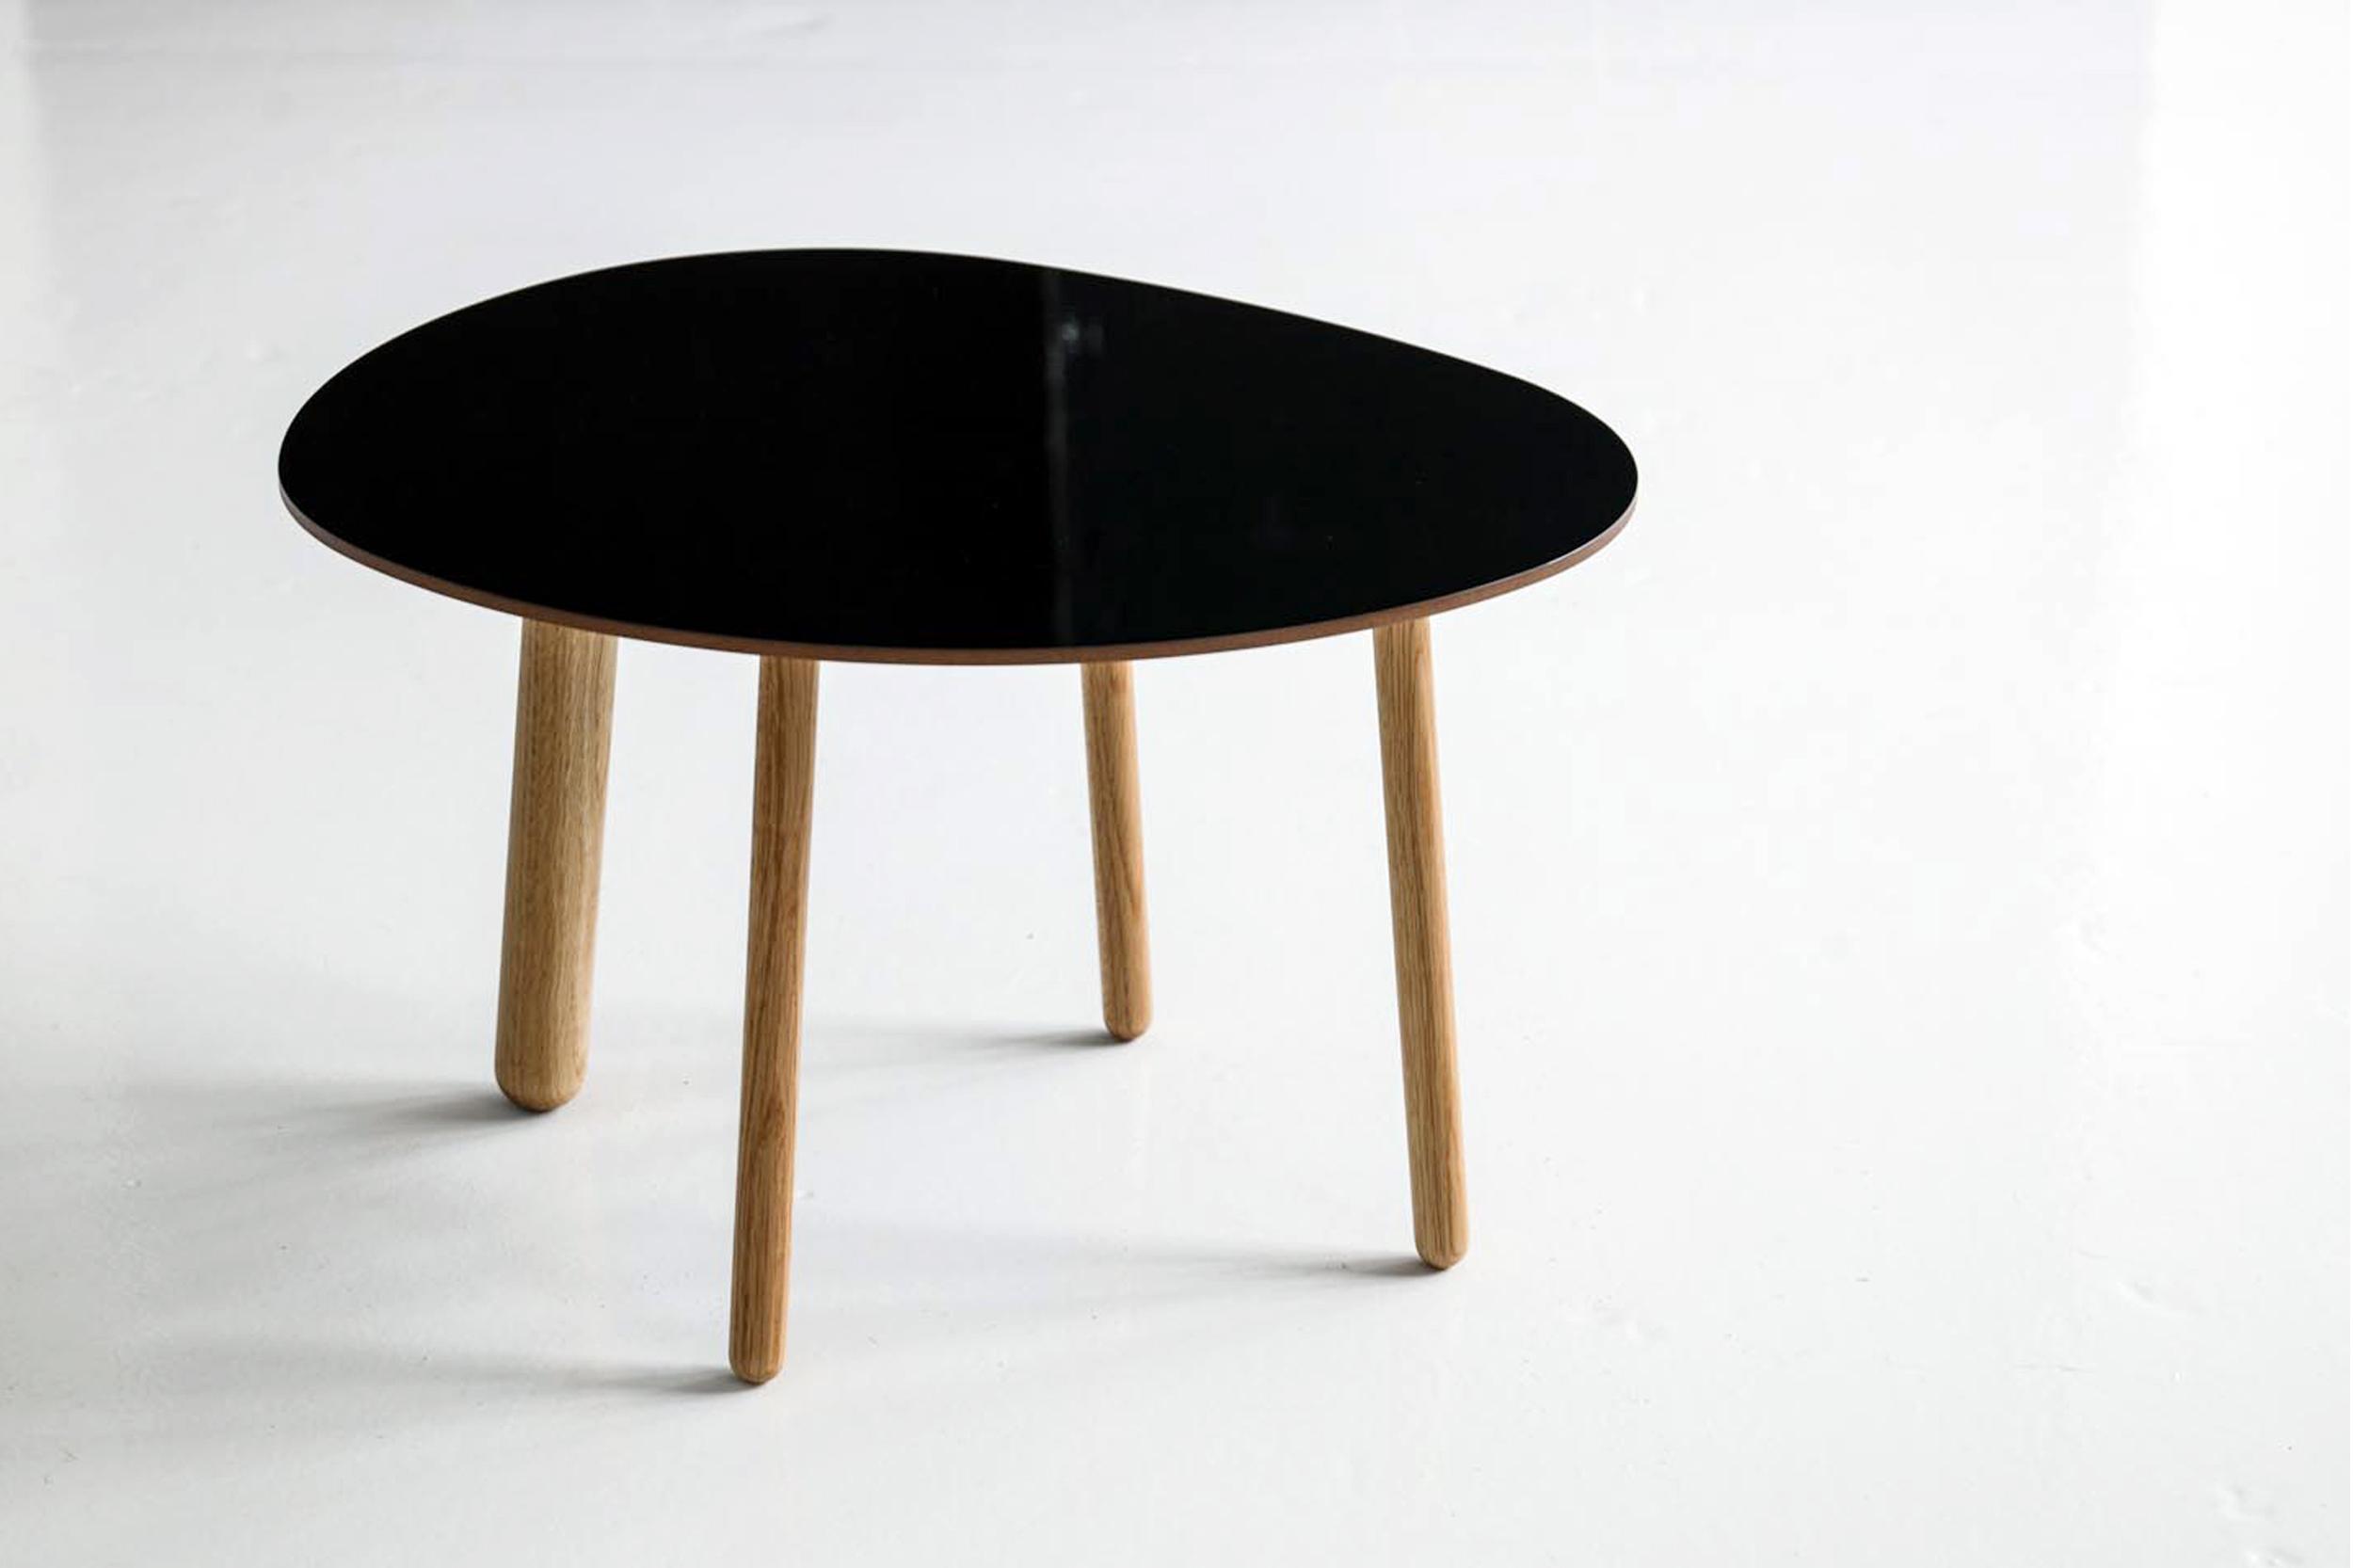 Morris coffee table model 1 in glossy black